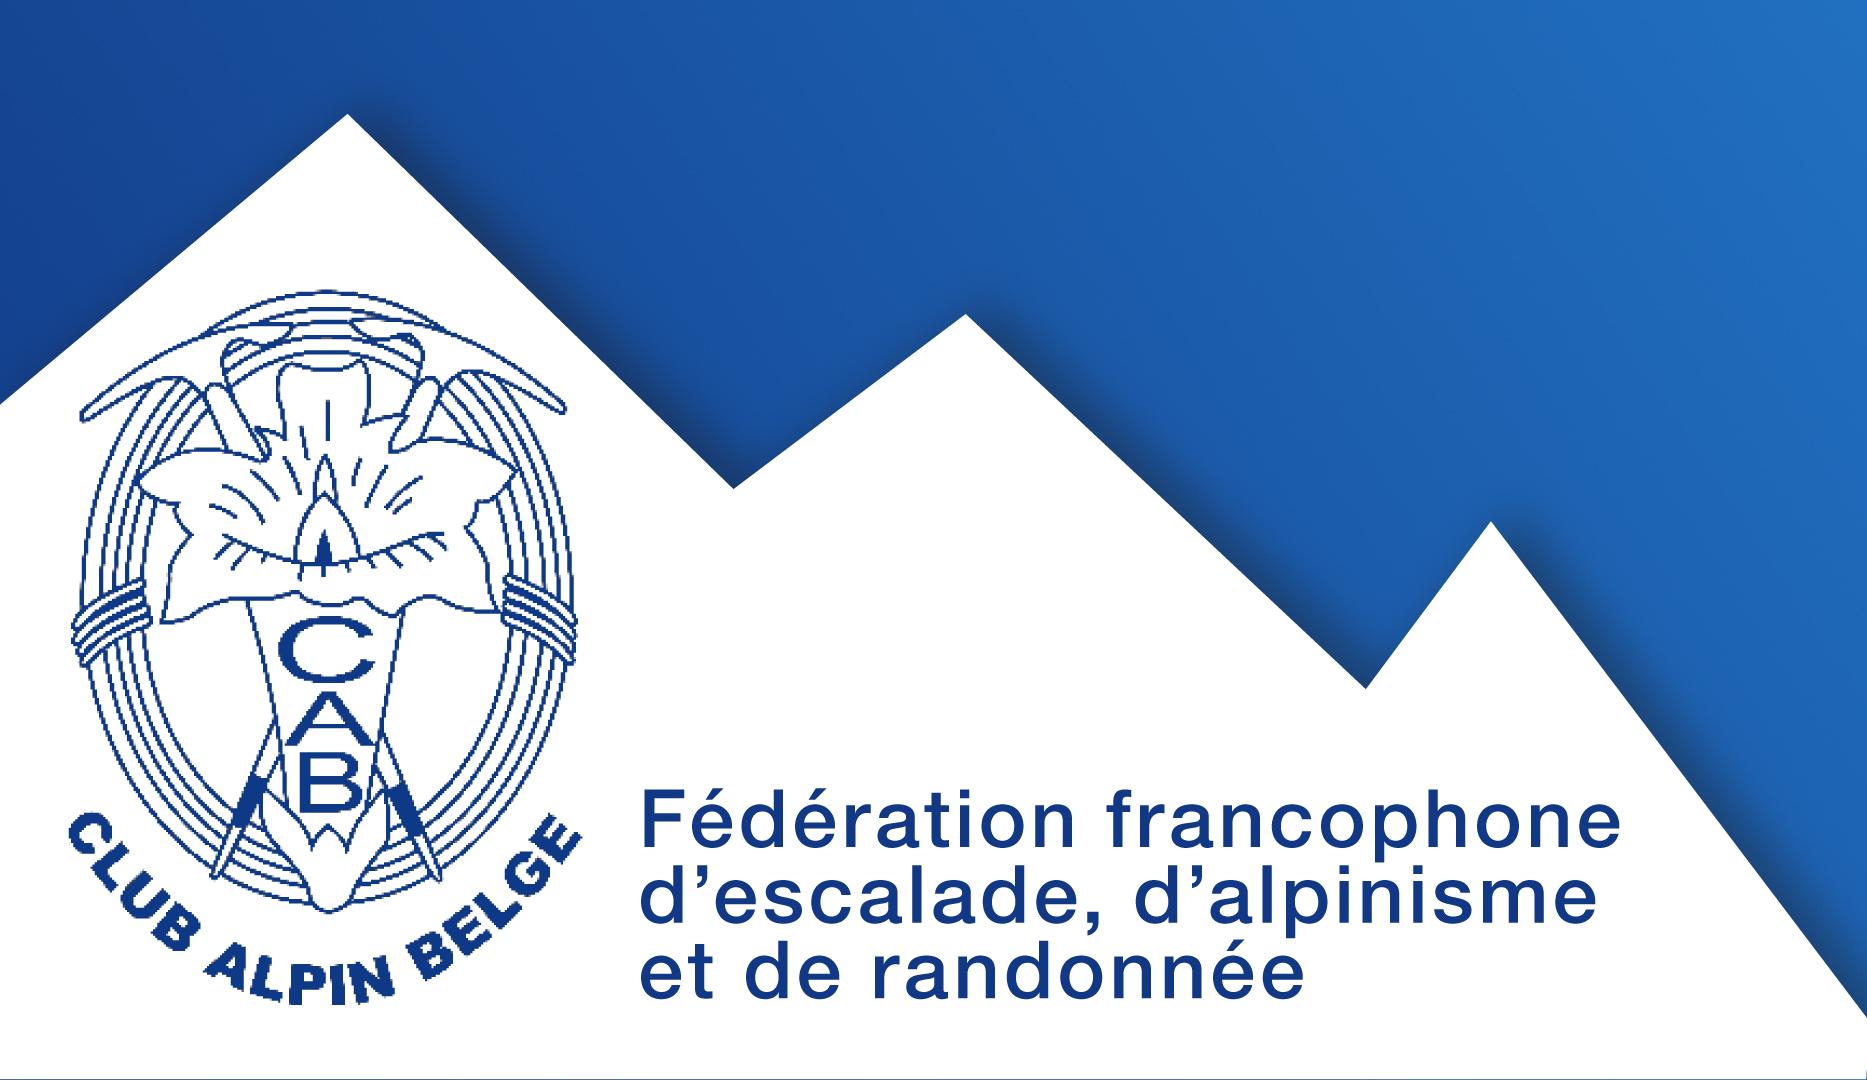 CLUB ALPIN BELGE - FÉDÉRATION